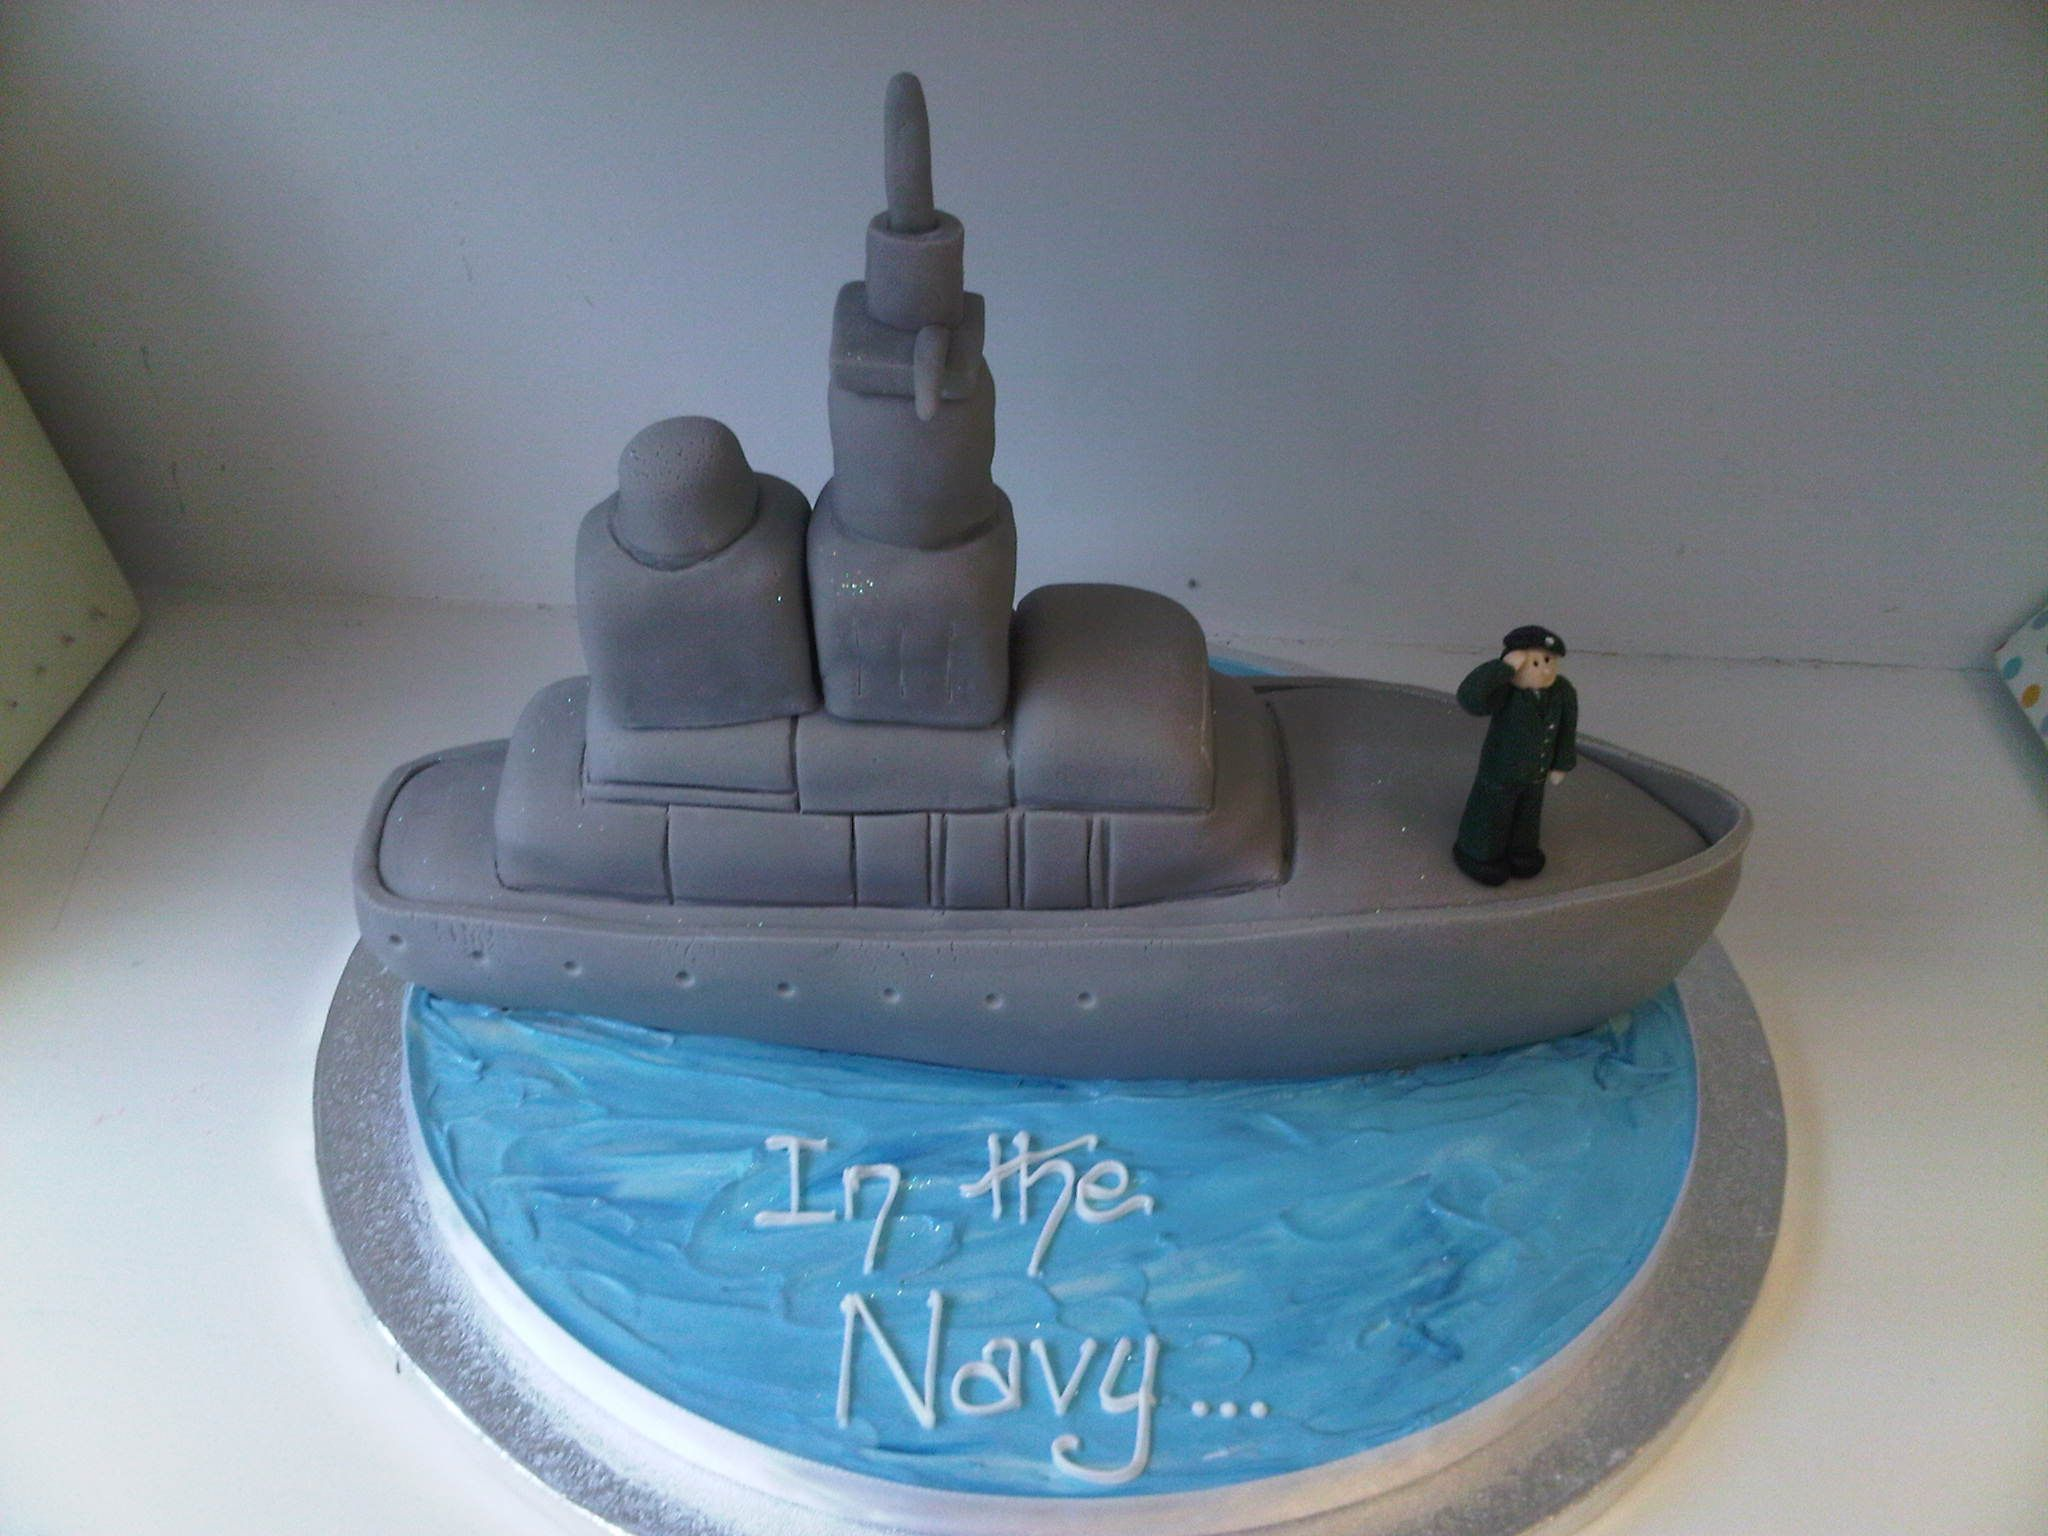 navy ship cake Cakes Pinterest Navy ships Cake and Birthday cakes